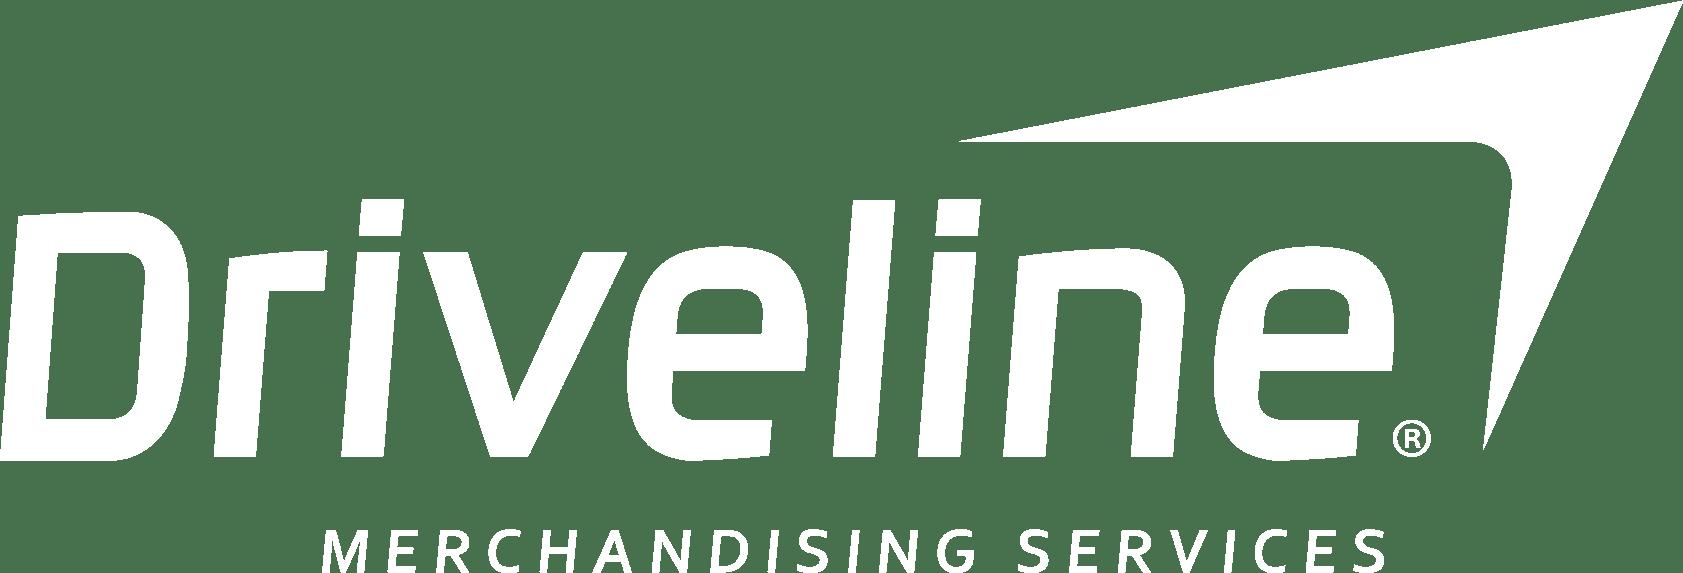 driveline-logo-white